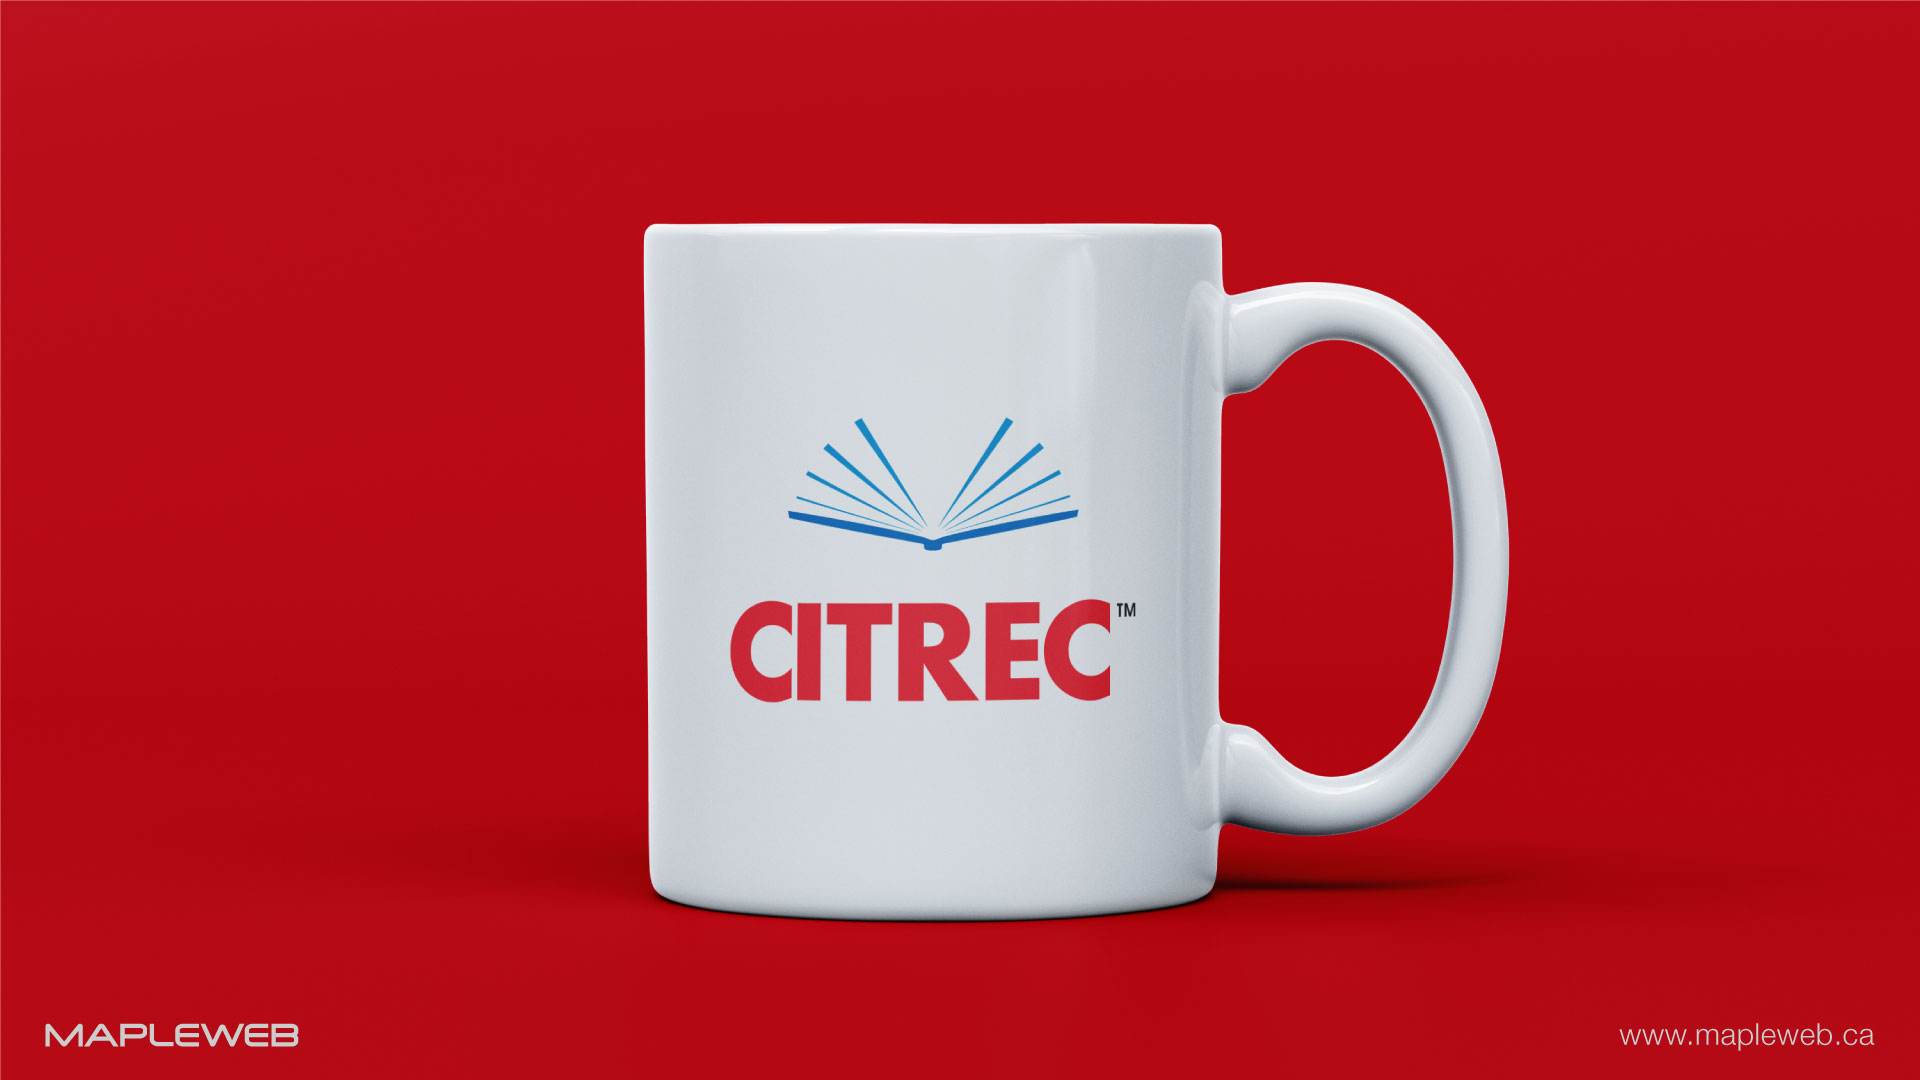 citrec-brand-logo-design-by-mapleweb-vancouver-canada-mug-mock